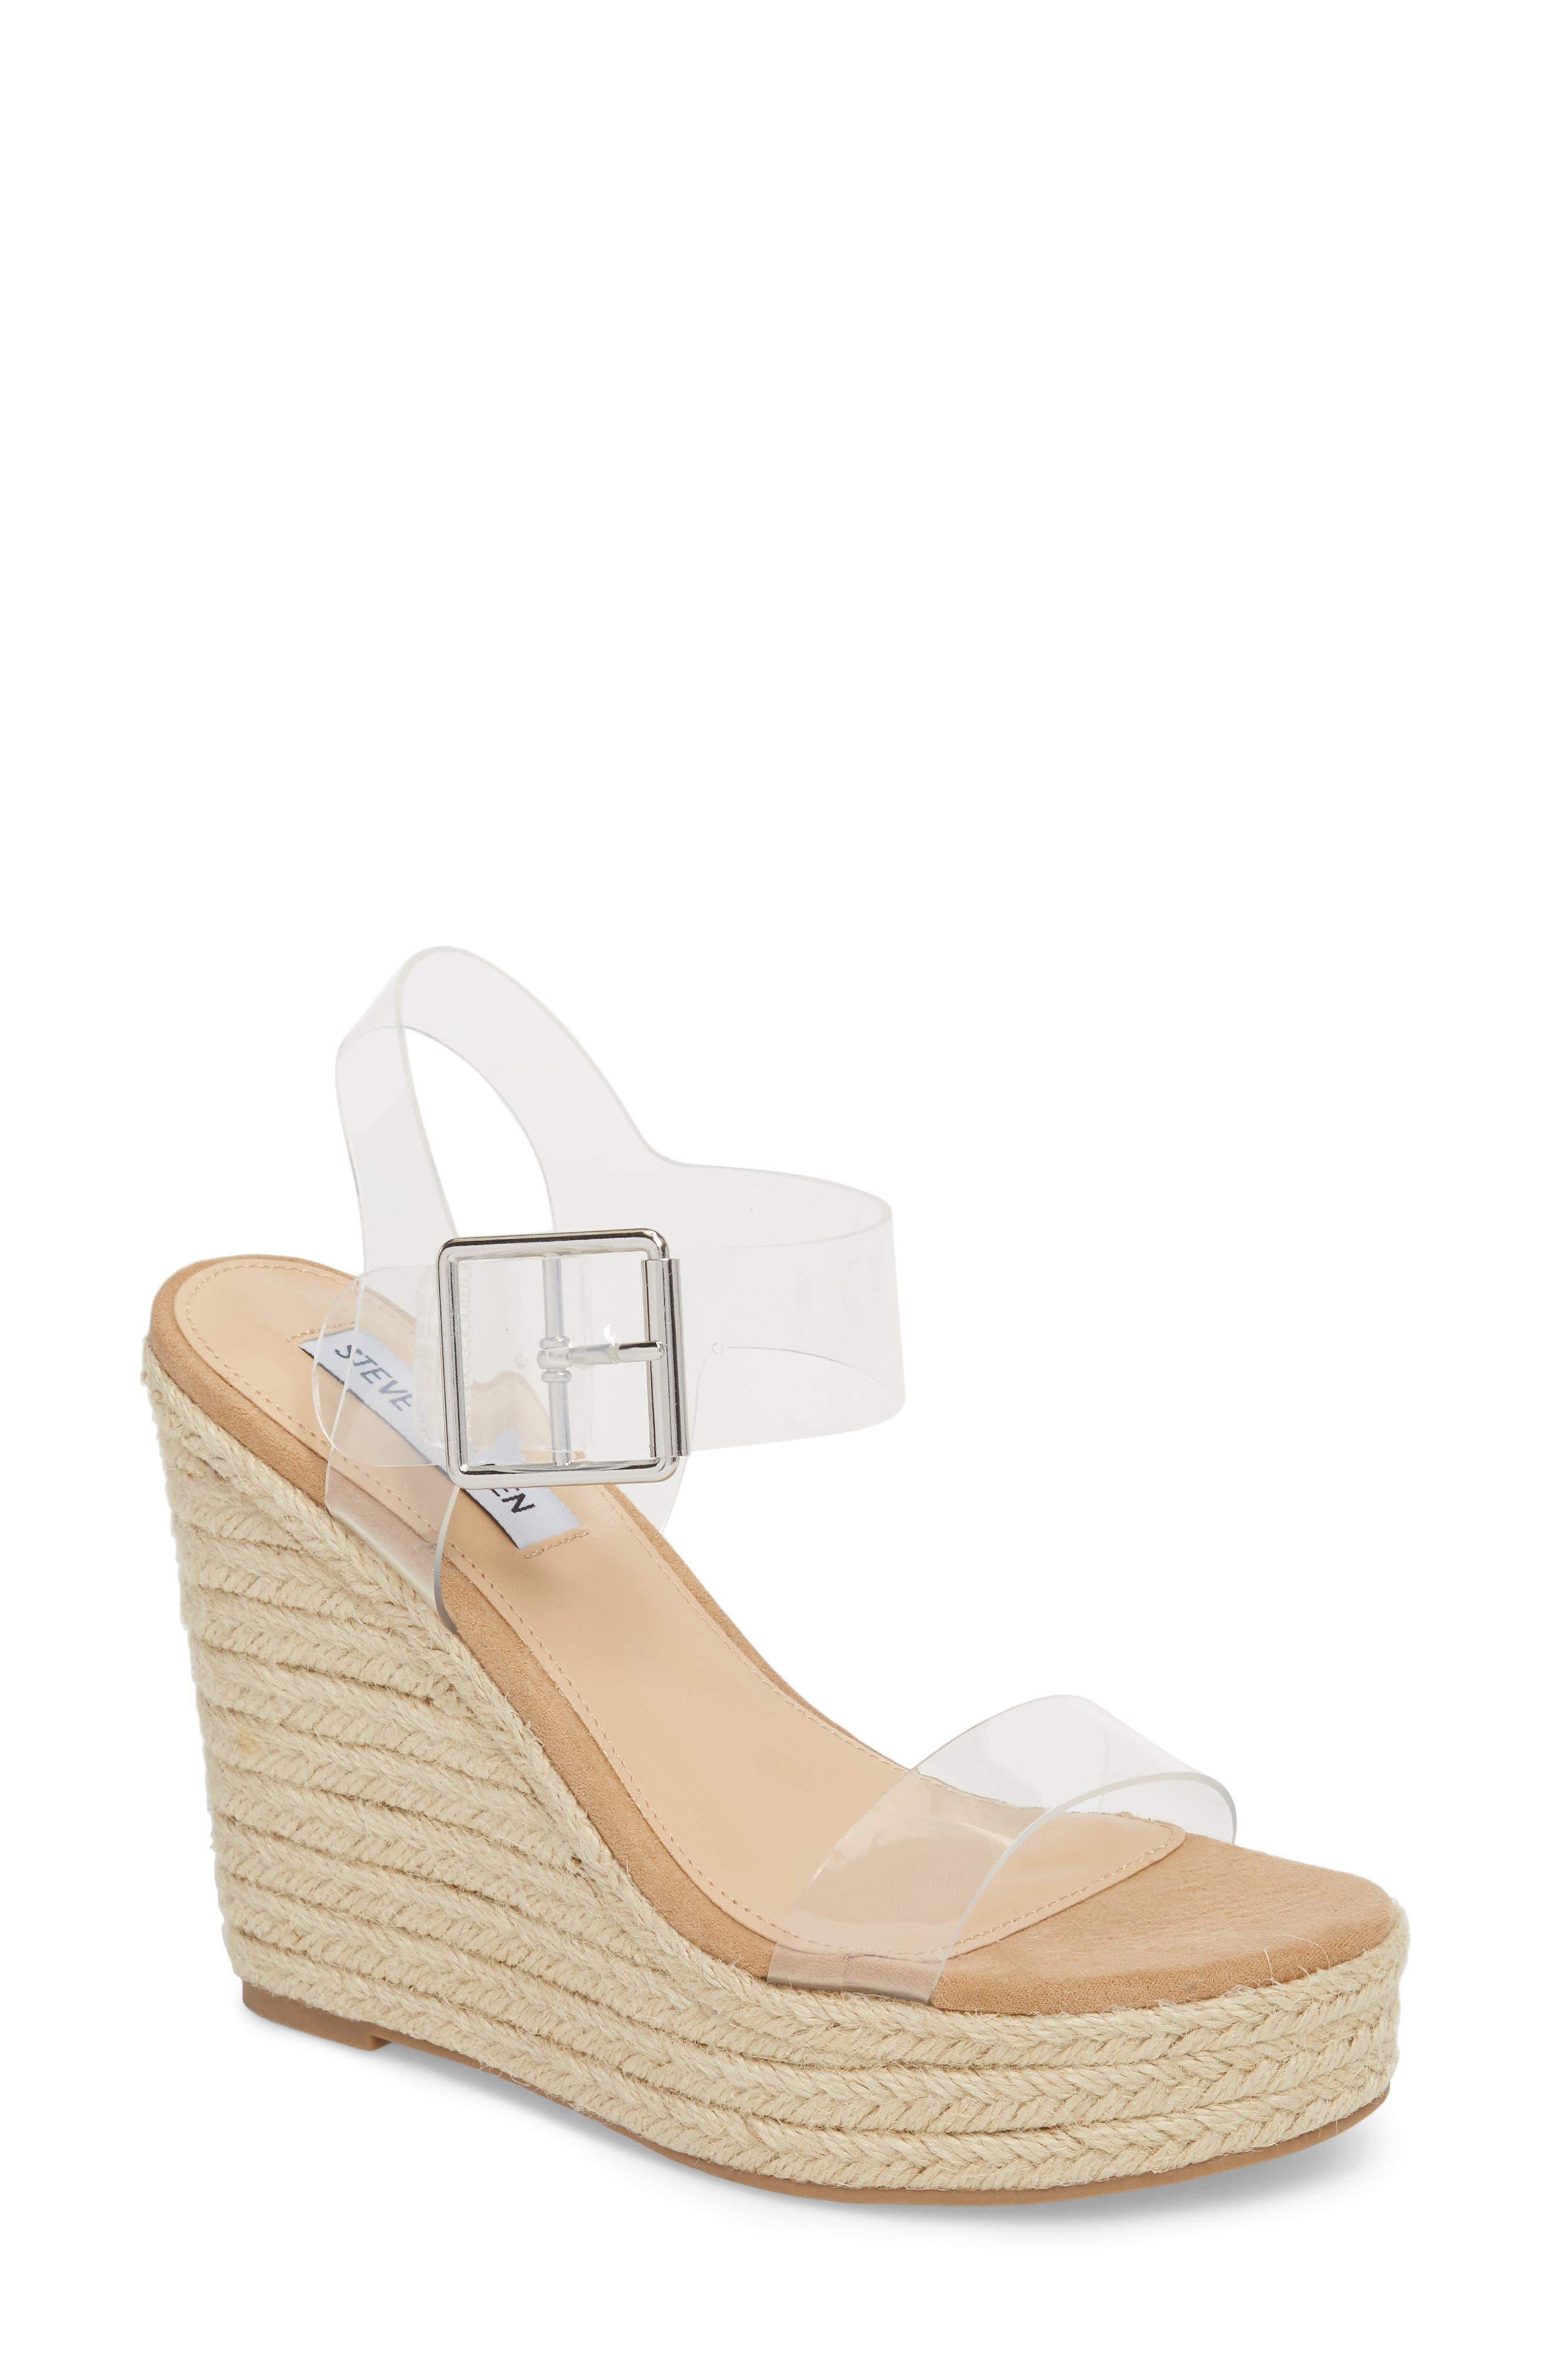 Splash Transparent Strap Wedge Sandal,                             Main thumbnail 1, color,                             250